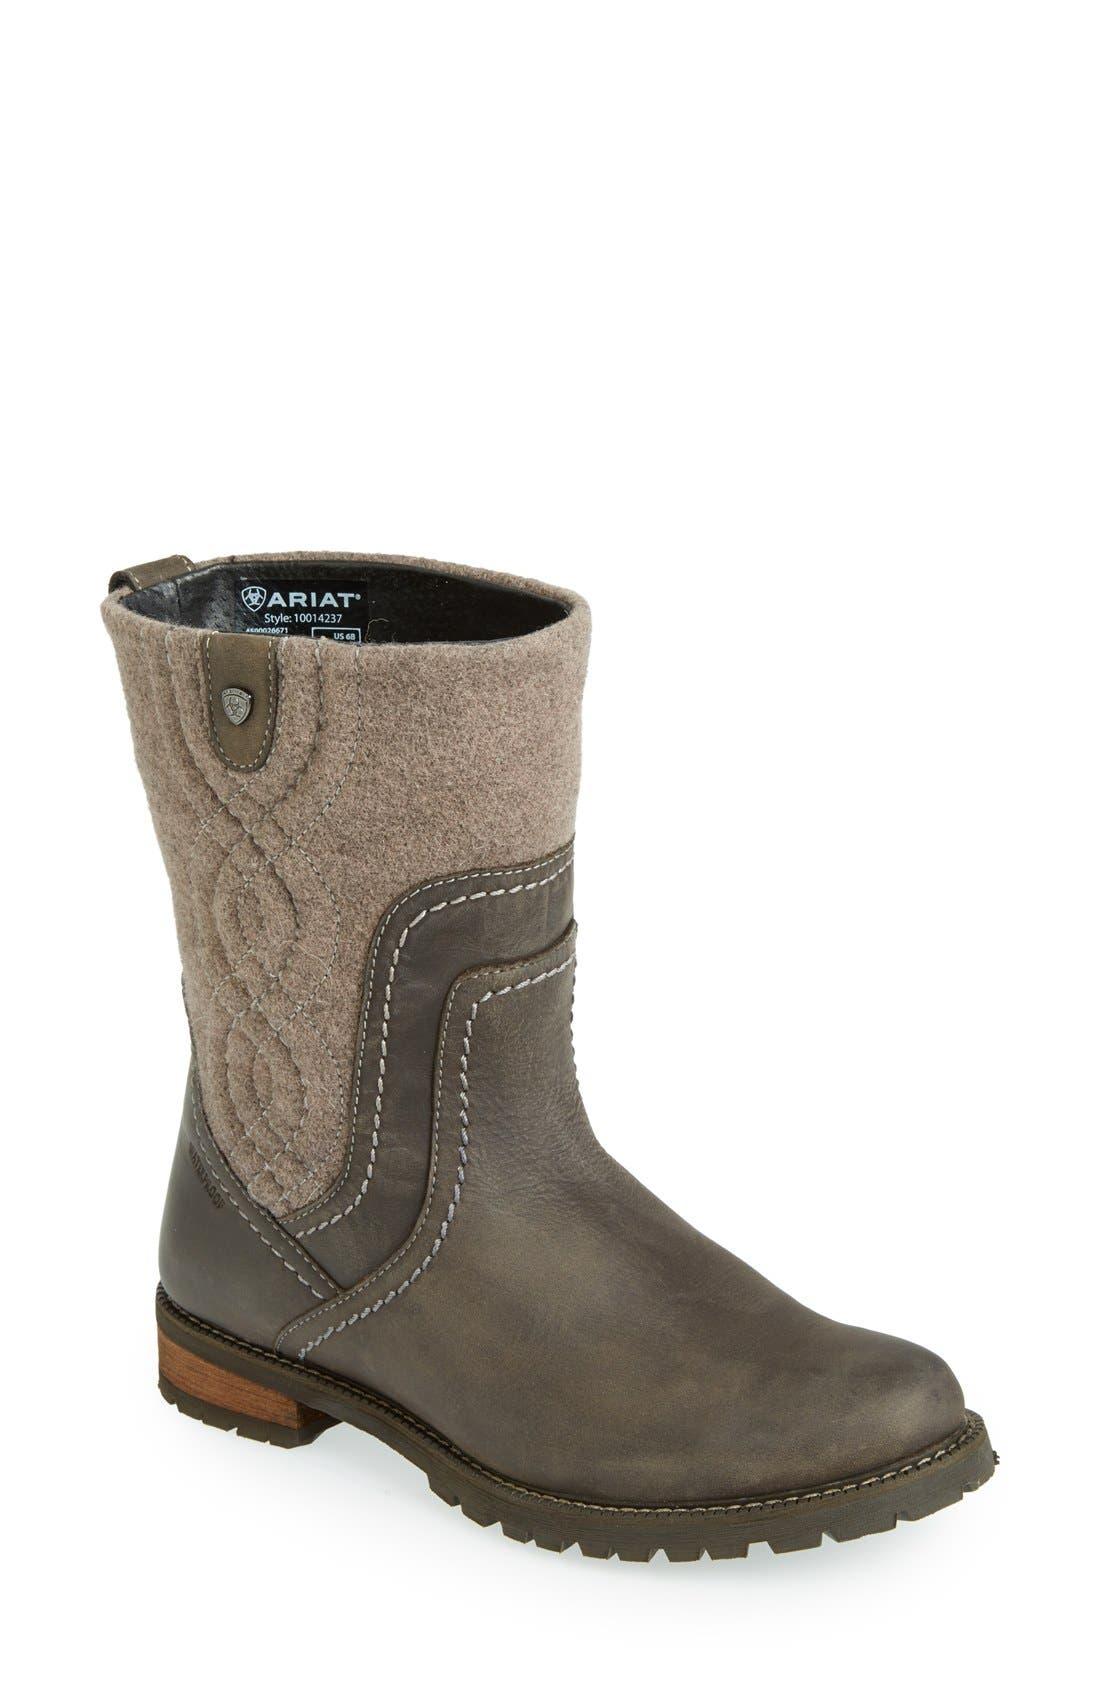 Main Image - Ariat 'Shannon H20' Waterproof Boot (Women)